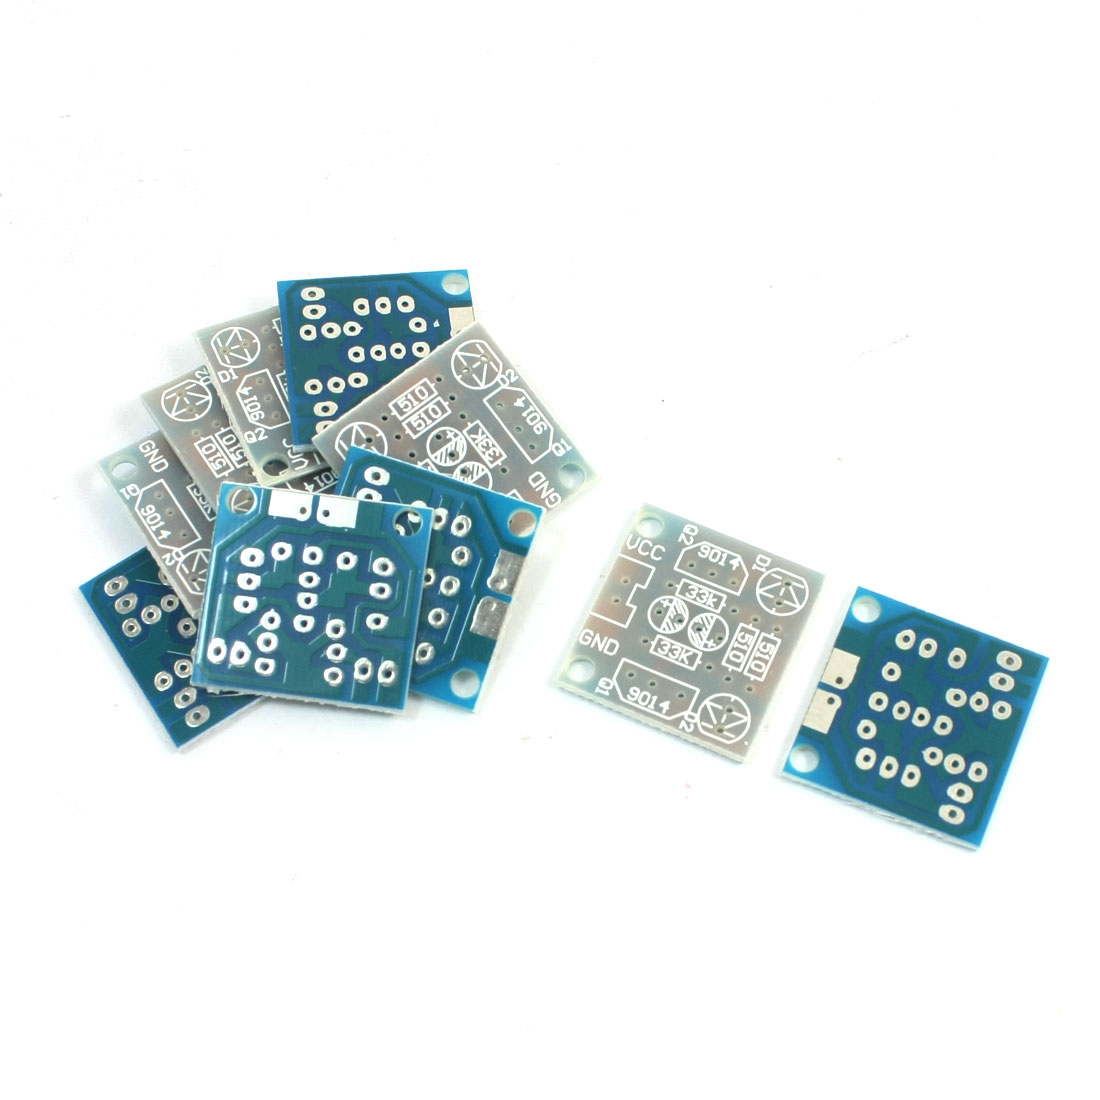 10 Pcs 5mm LED DIY Simple Flash Circuit Electronic Production Kits PCB Board